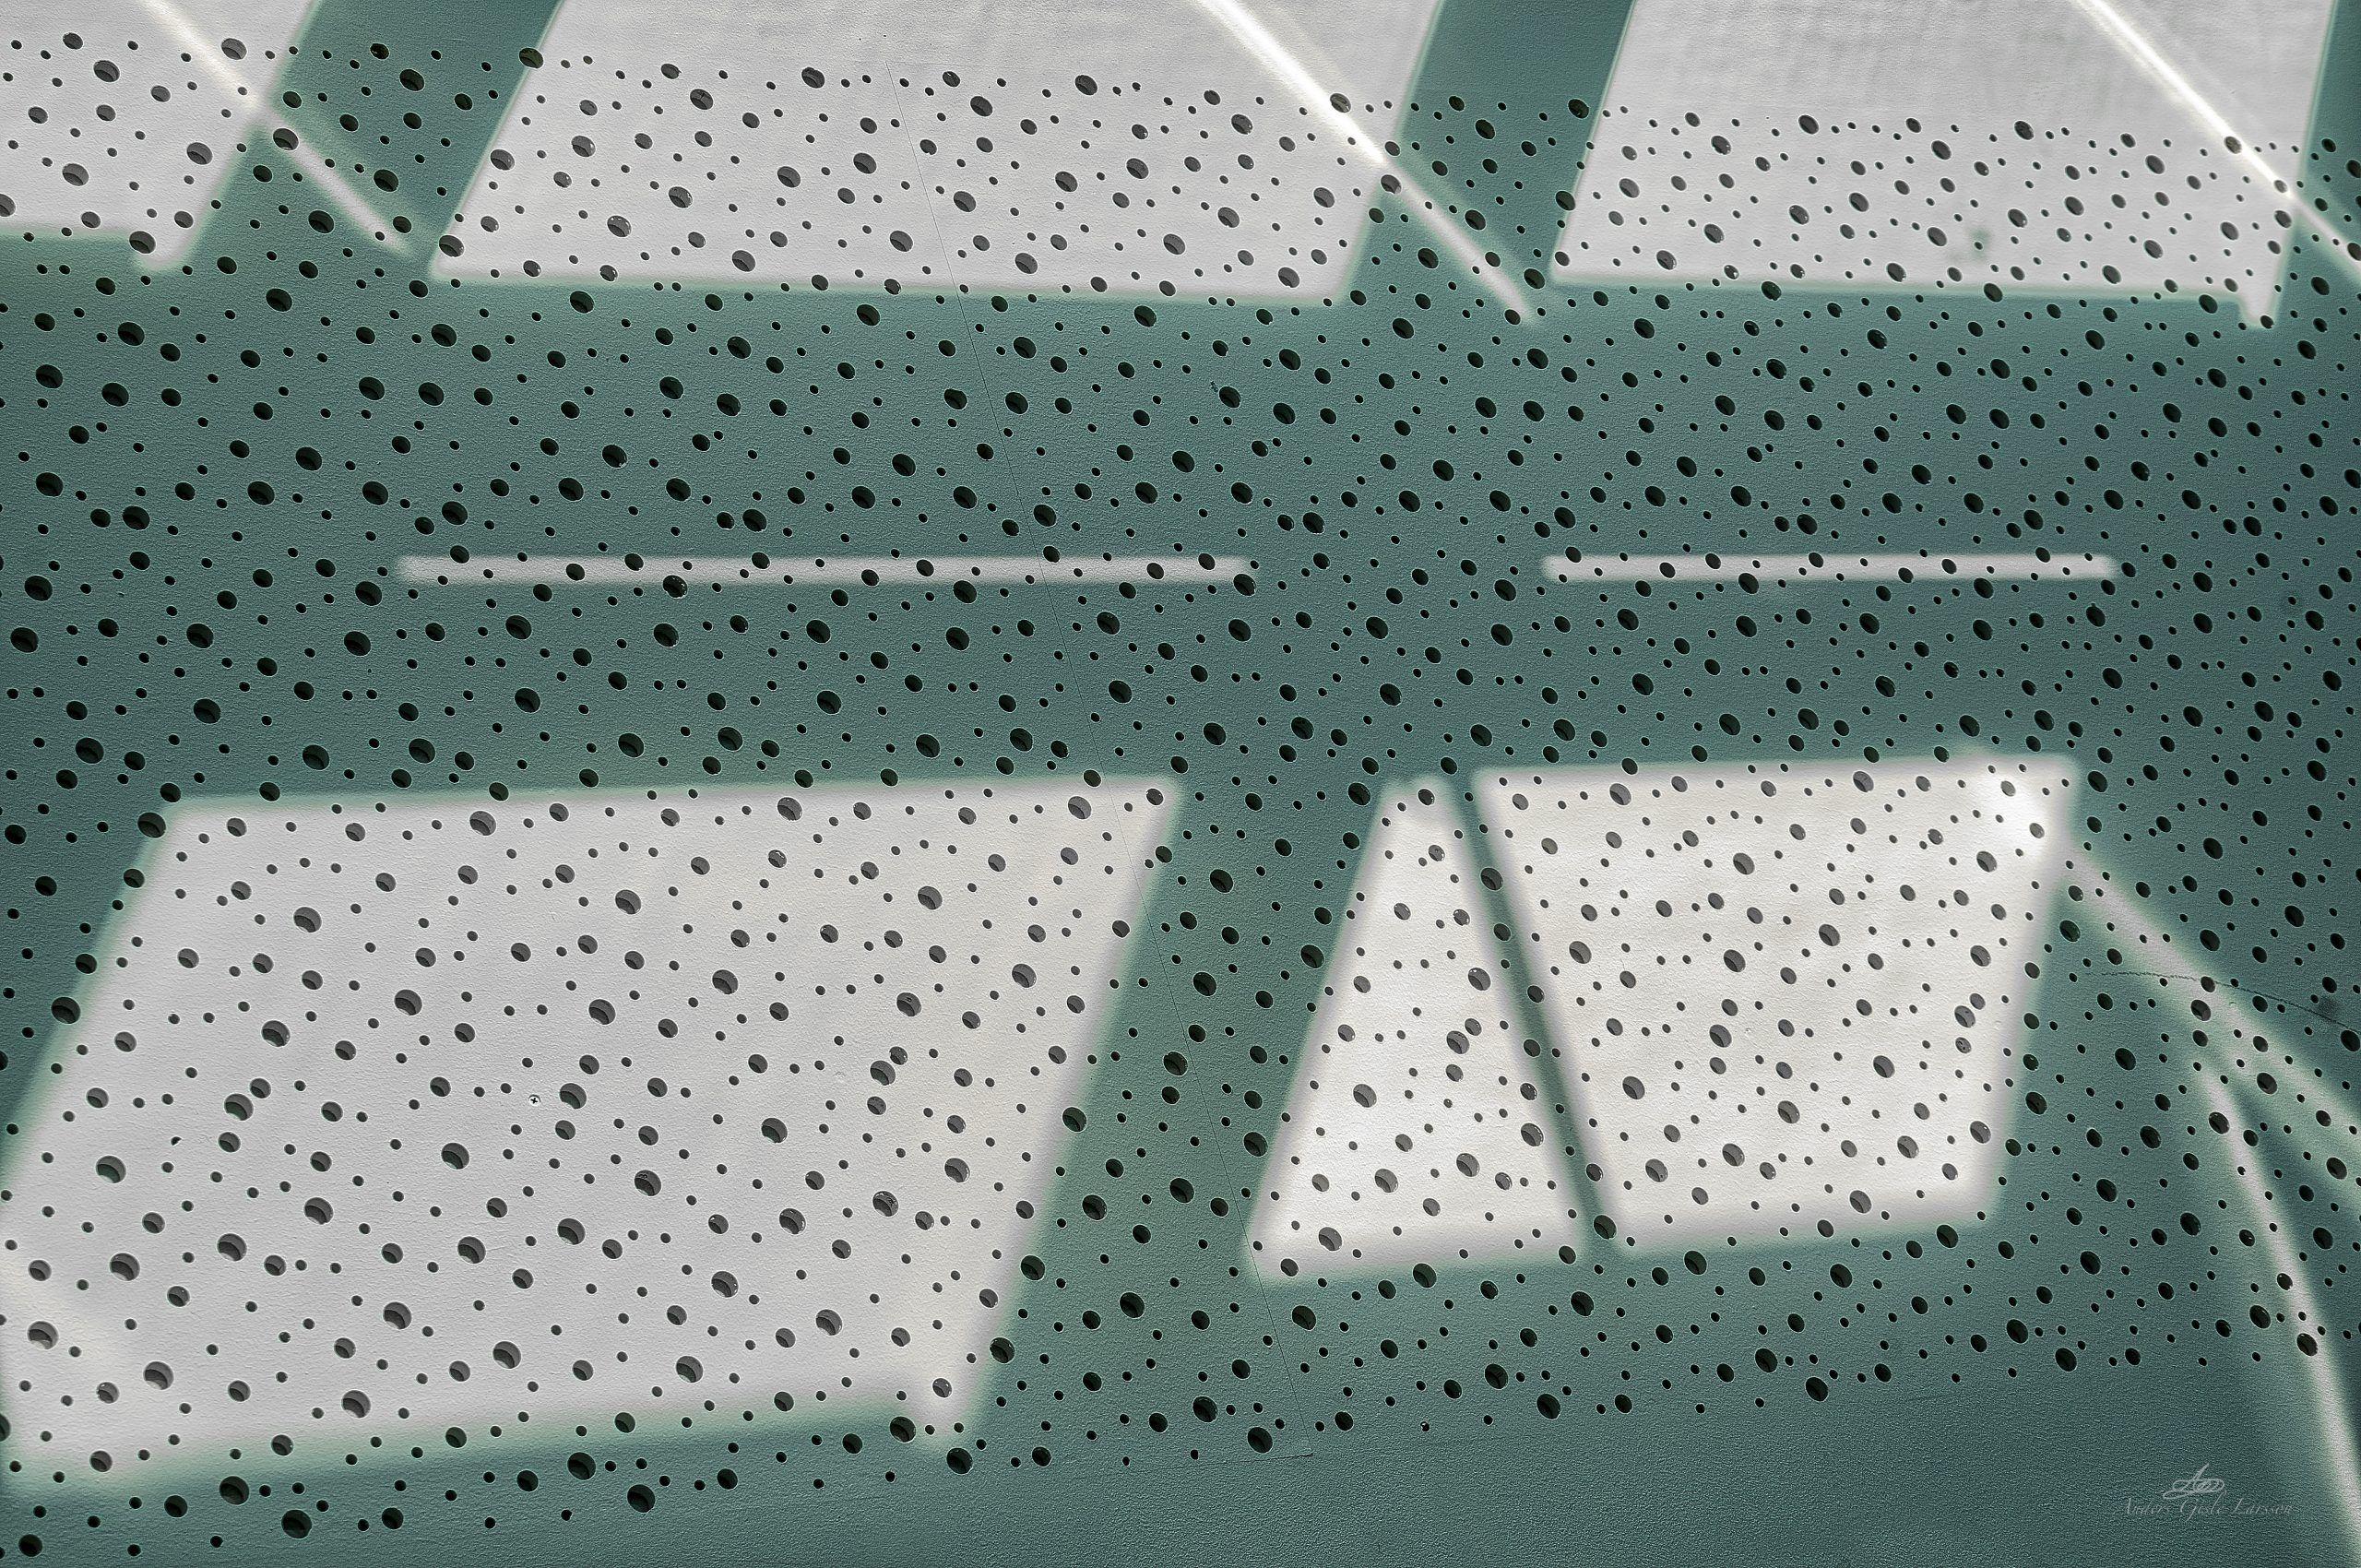 Structure, 276/365, Uge 40, Business Academy Aarhus, Viby, Aarhus